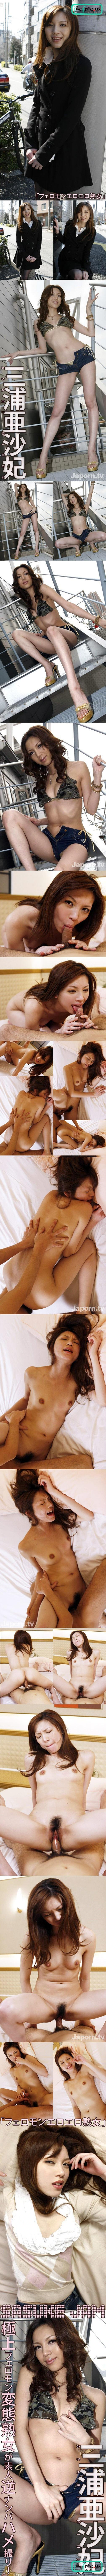 [SSKJ 002] サスケジャム Vol.2 フェロモンエロエロ熟女 : 三浦沙紀(Saki Miura) 熟女 三浦沙紀 SSKJ Saki Miura MILF